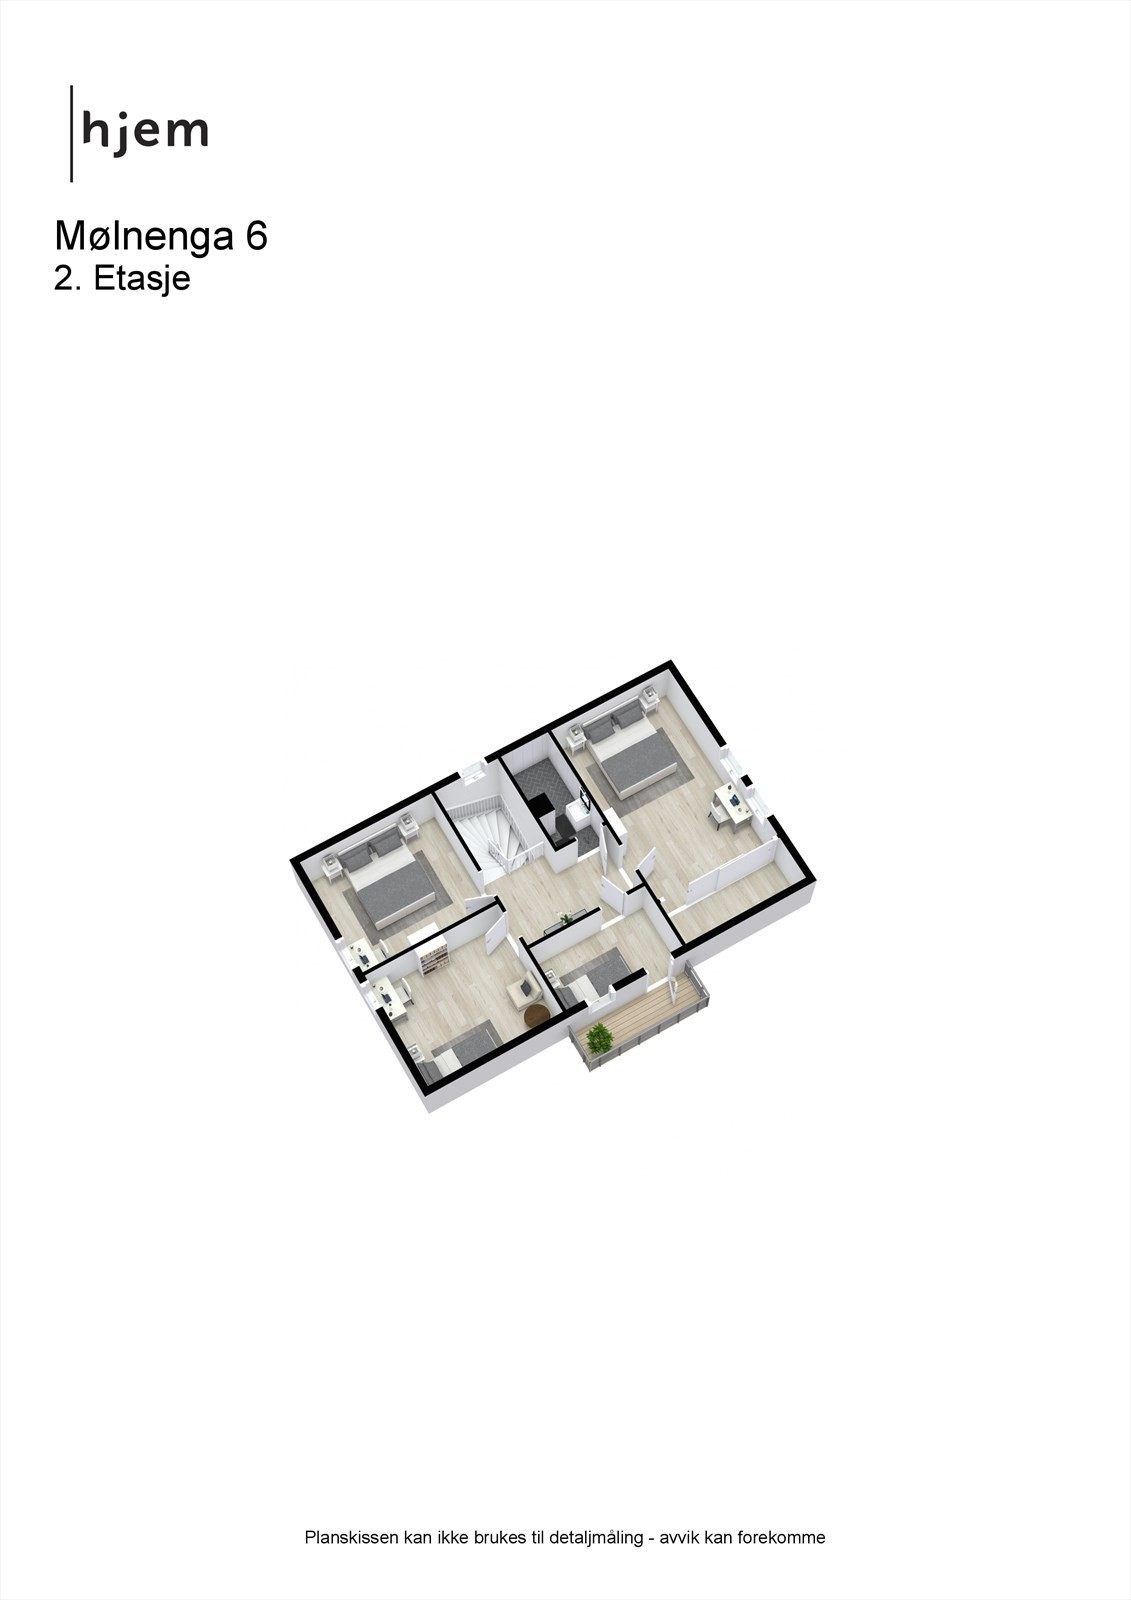 Mølnenga 6 - 3D - 2. Etasje - Letterhead.jpg